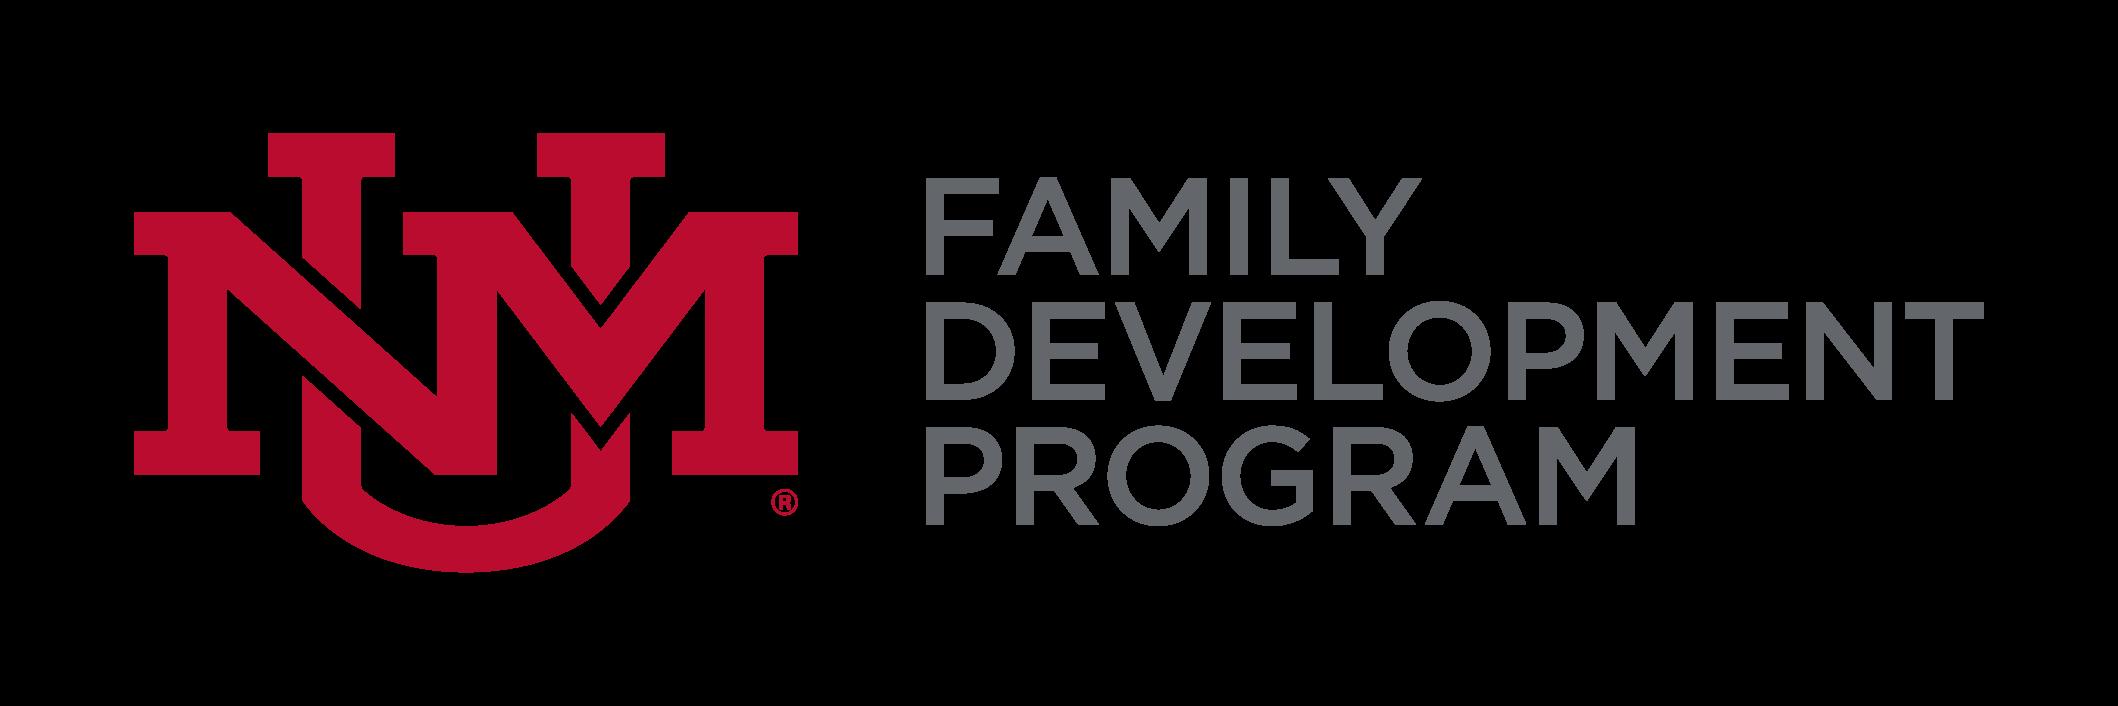 UNM Family Development Program